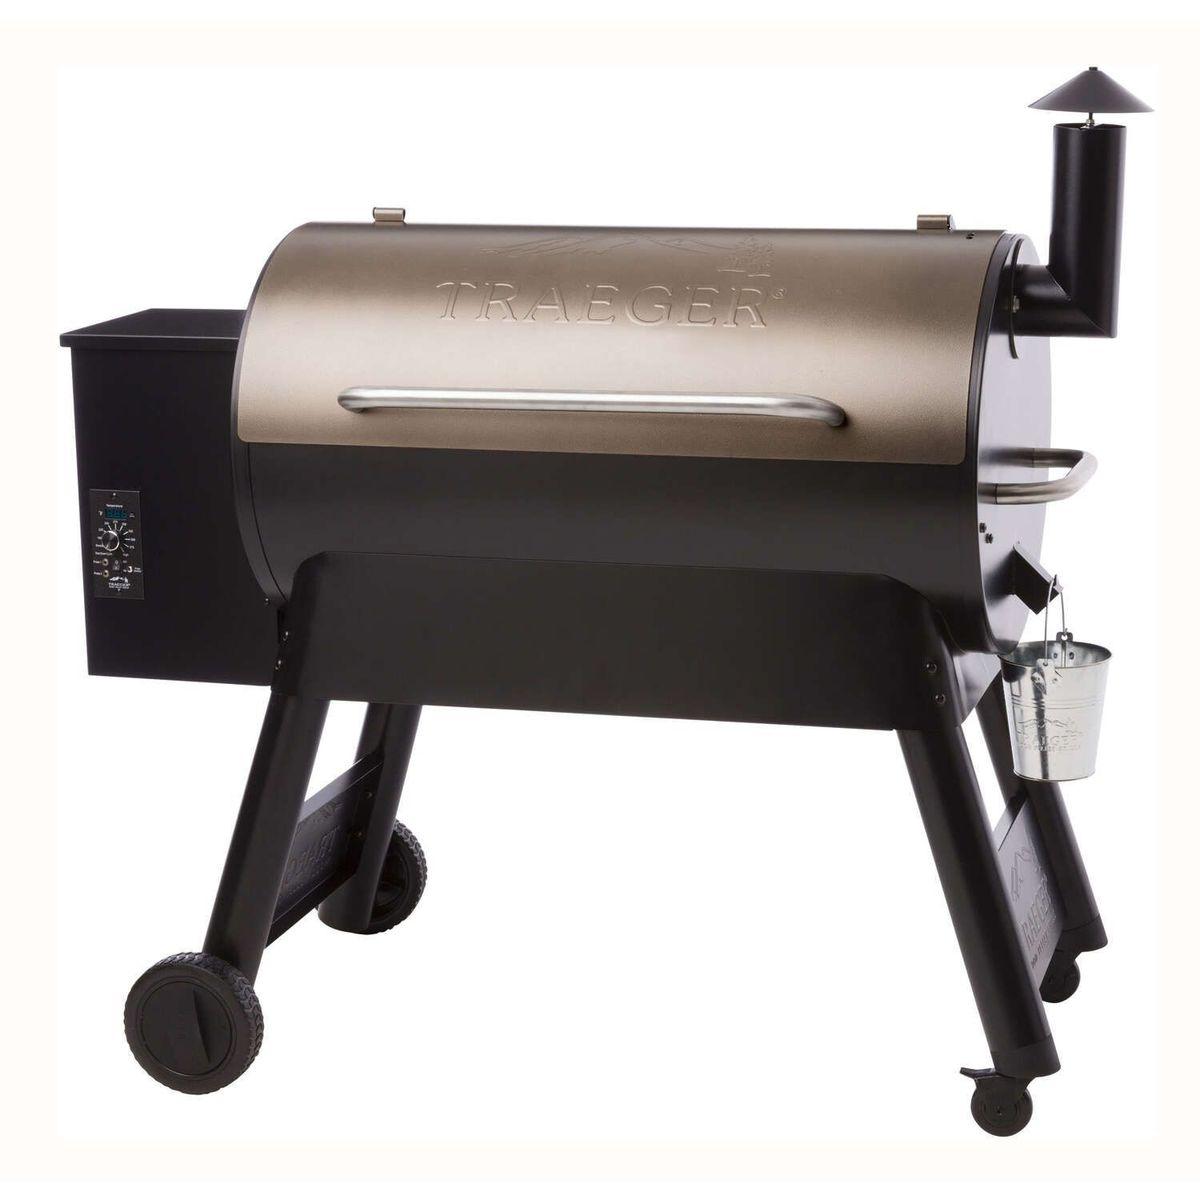 Traeger® Pro Series 34 Wood Pellet Grill thumbnail